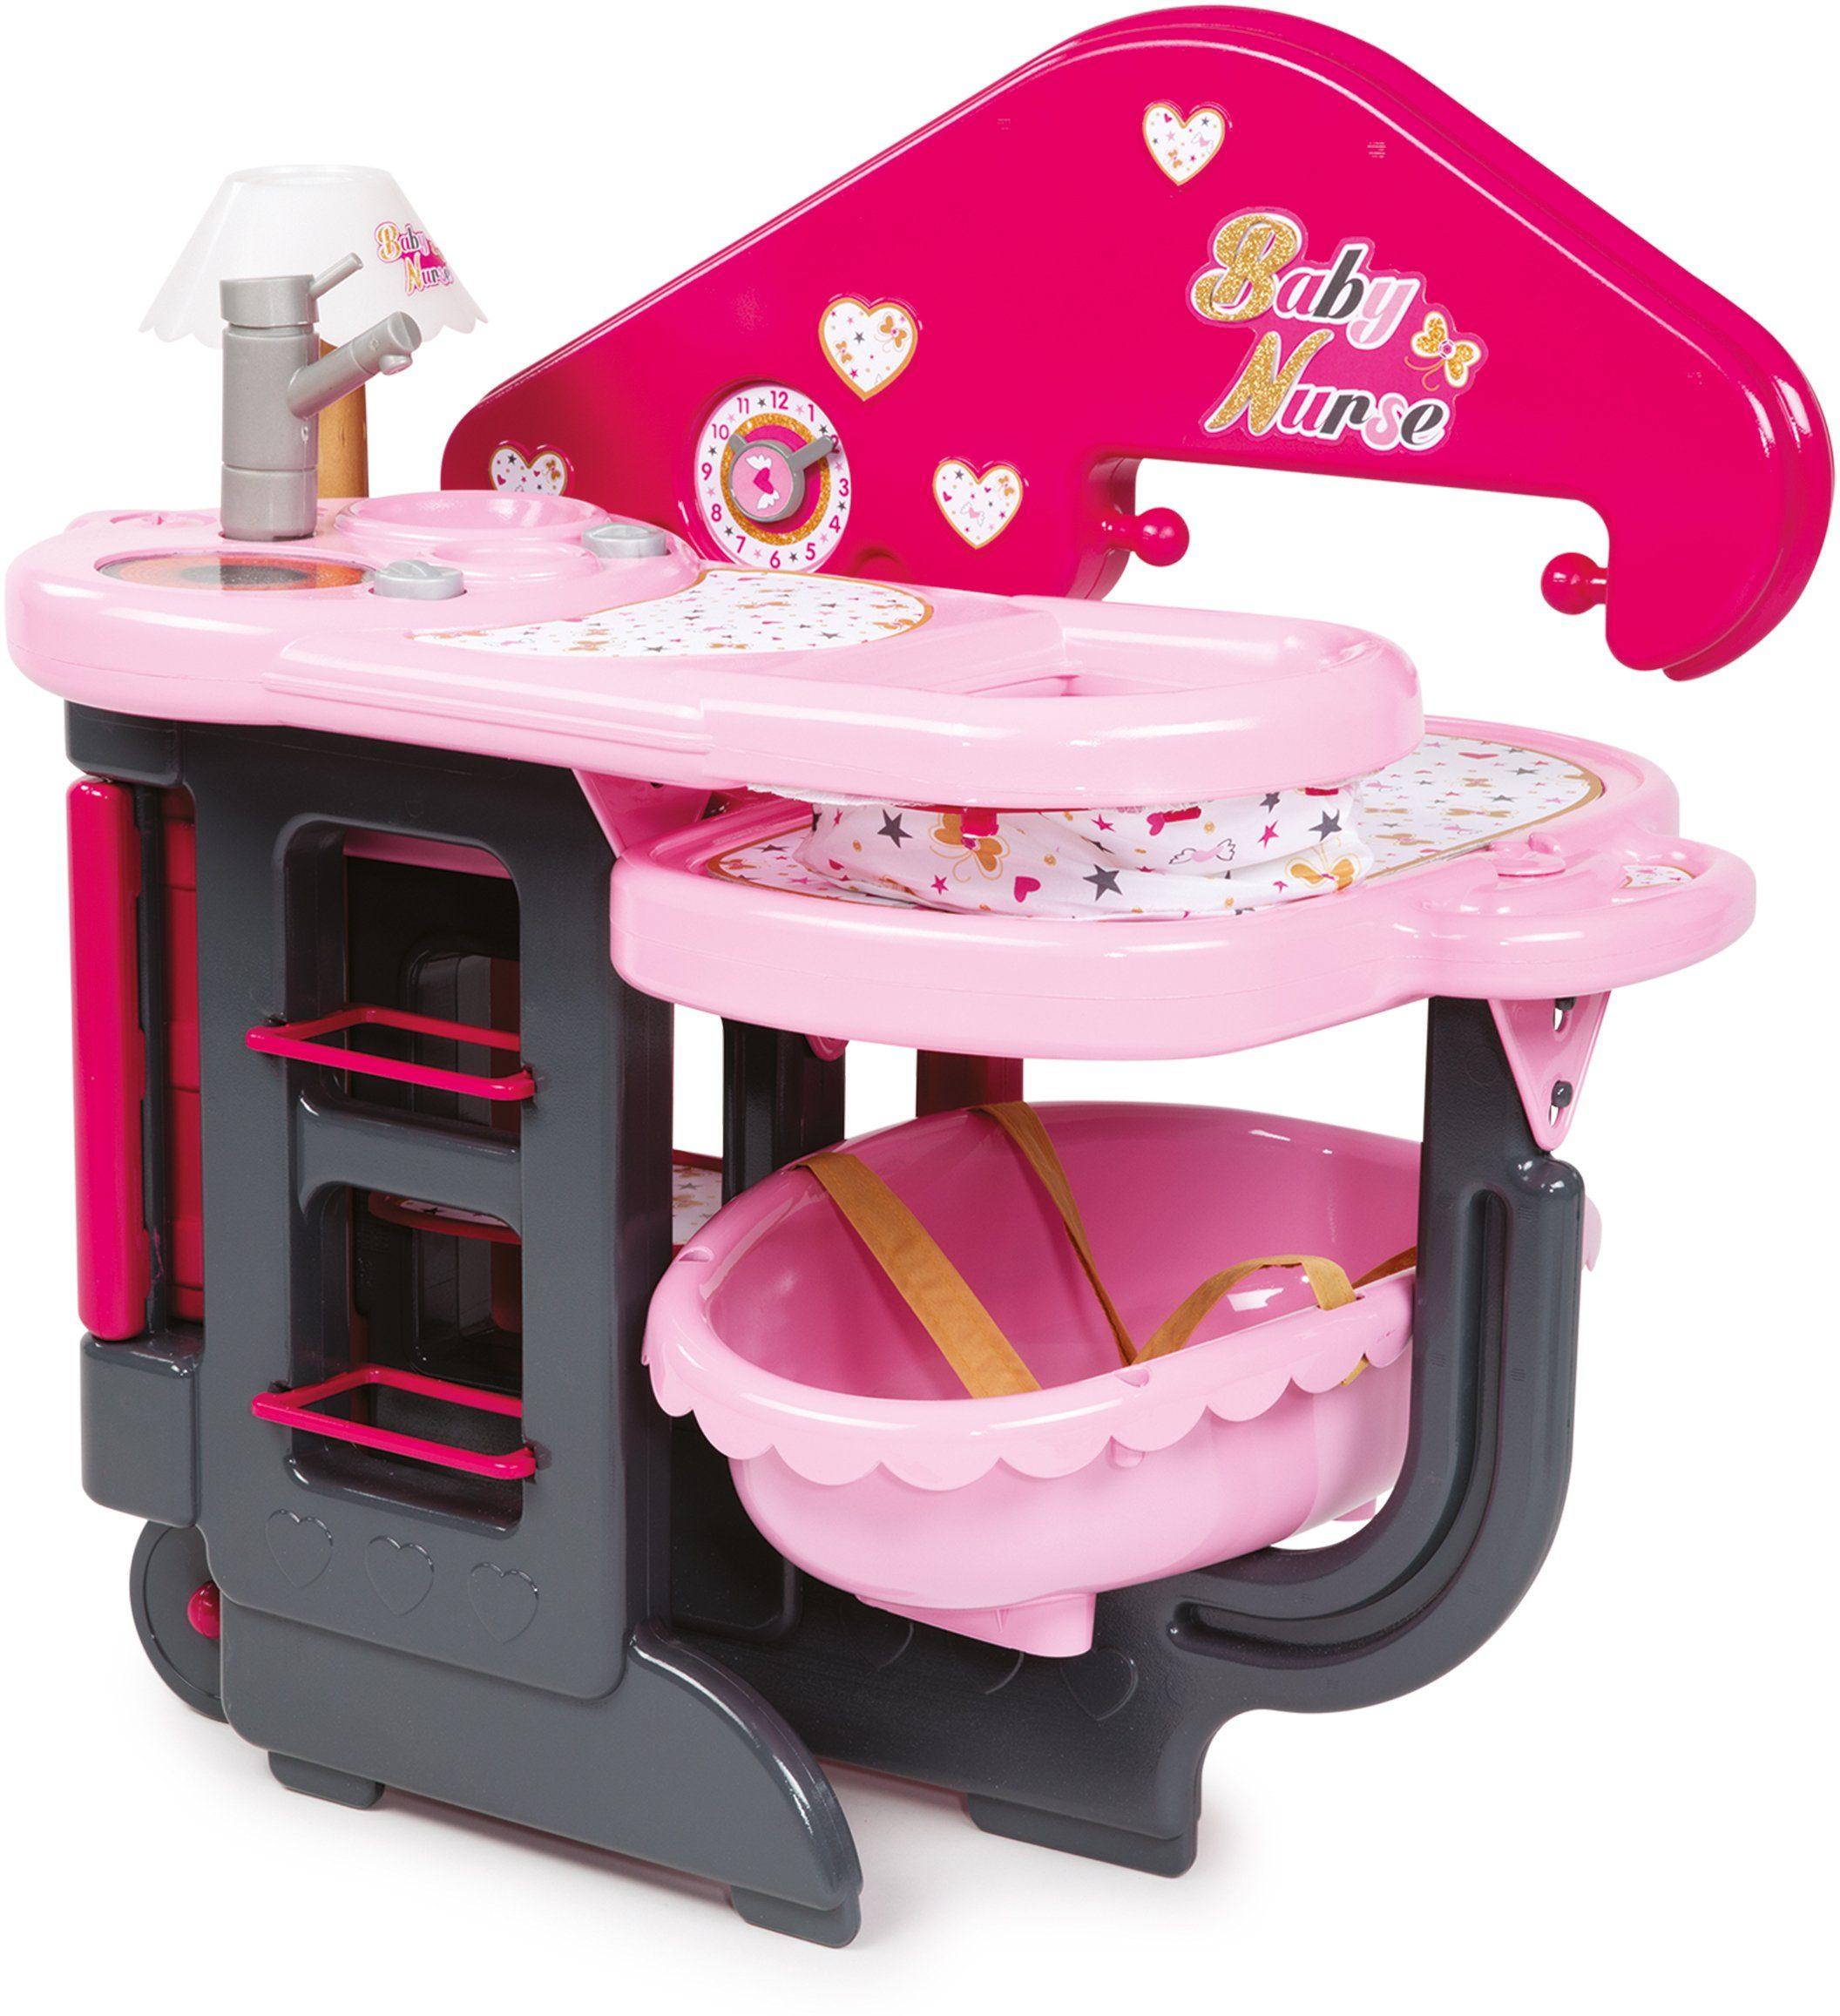 Smoby Puppenpflegecenter, »Baby Nurse Puppenpflegecenter«